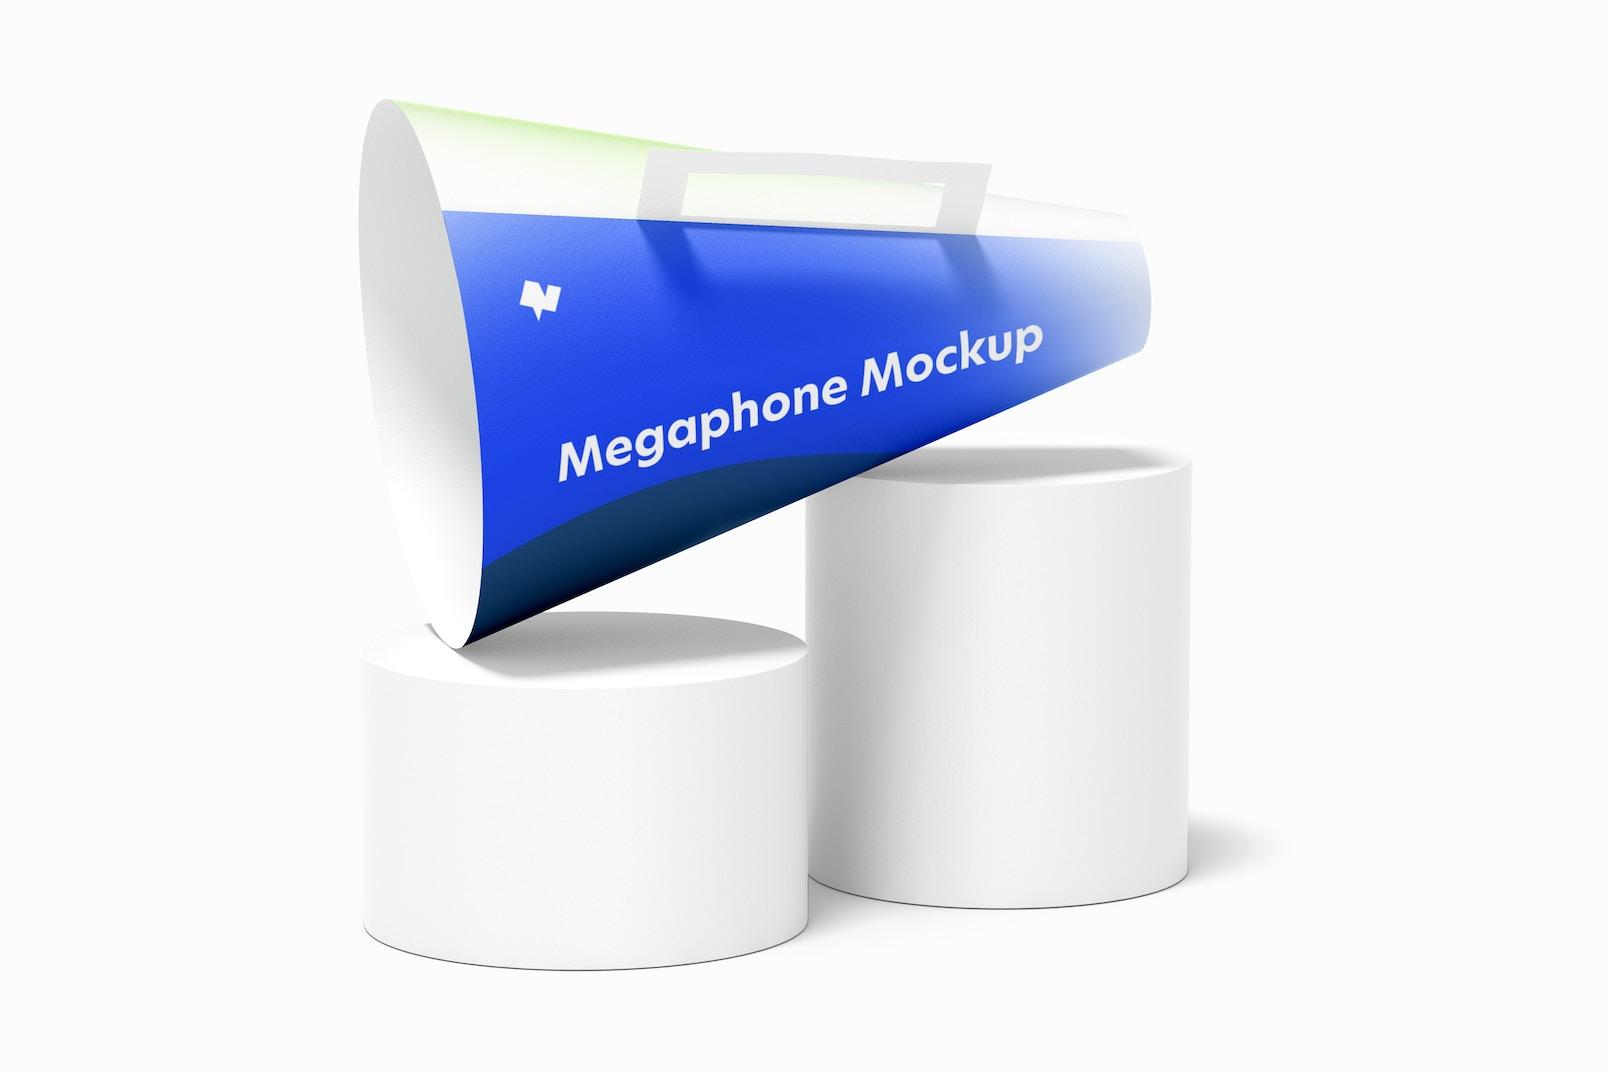 Paper Megaphone Mockup, Perspective